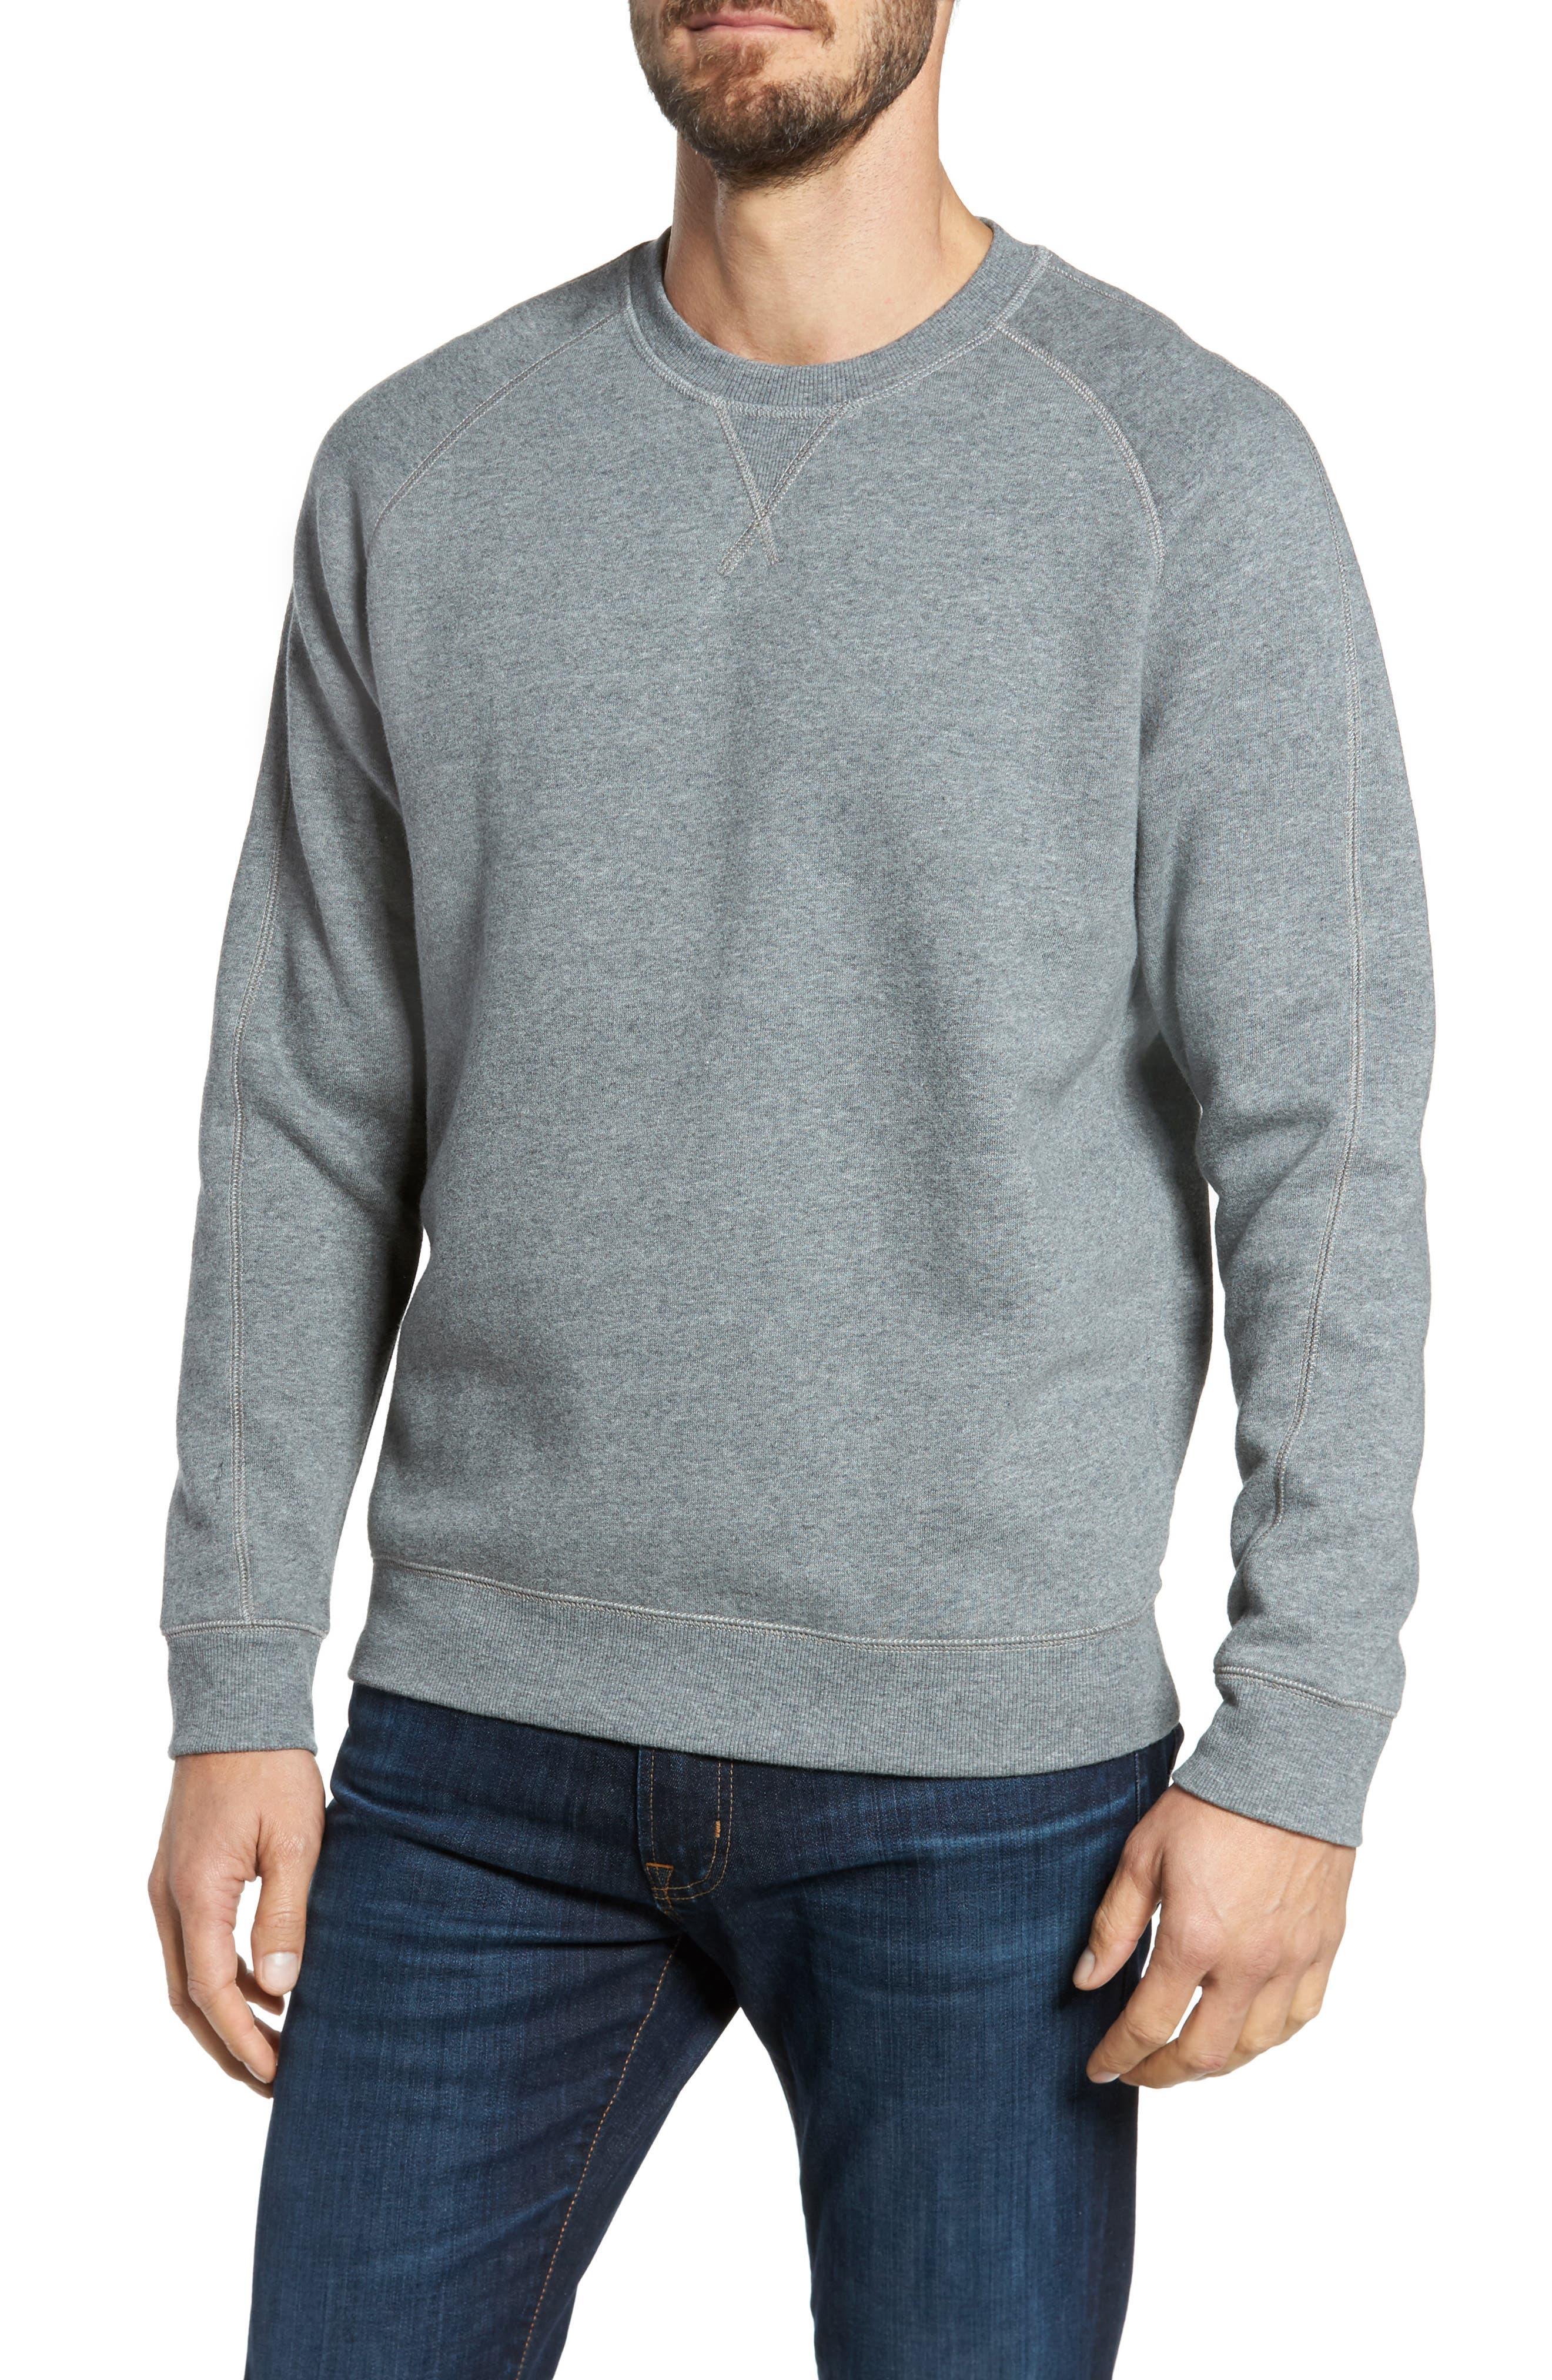 Fleece Sweatshirt,                             Main thumbnail 1, color,                             Grey Paloma Heather